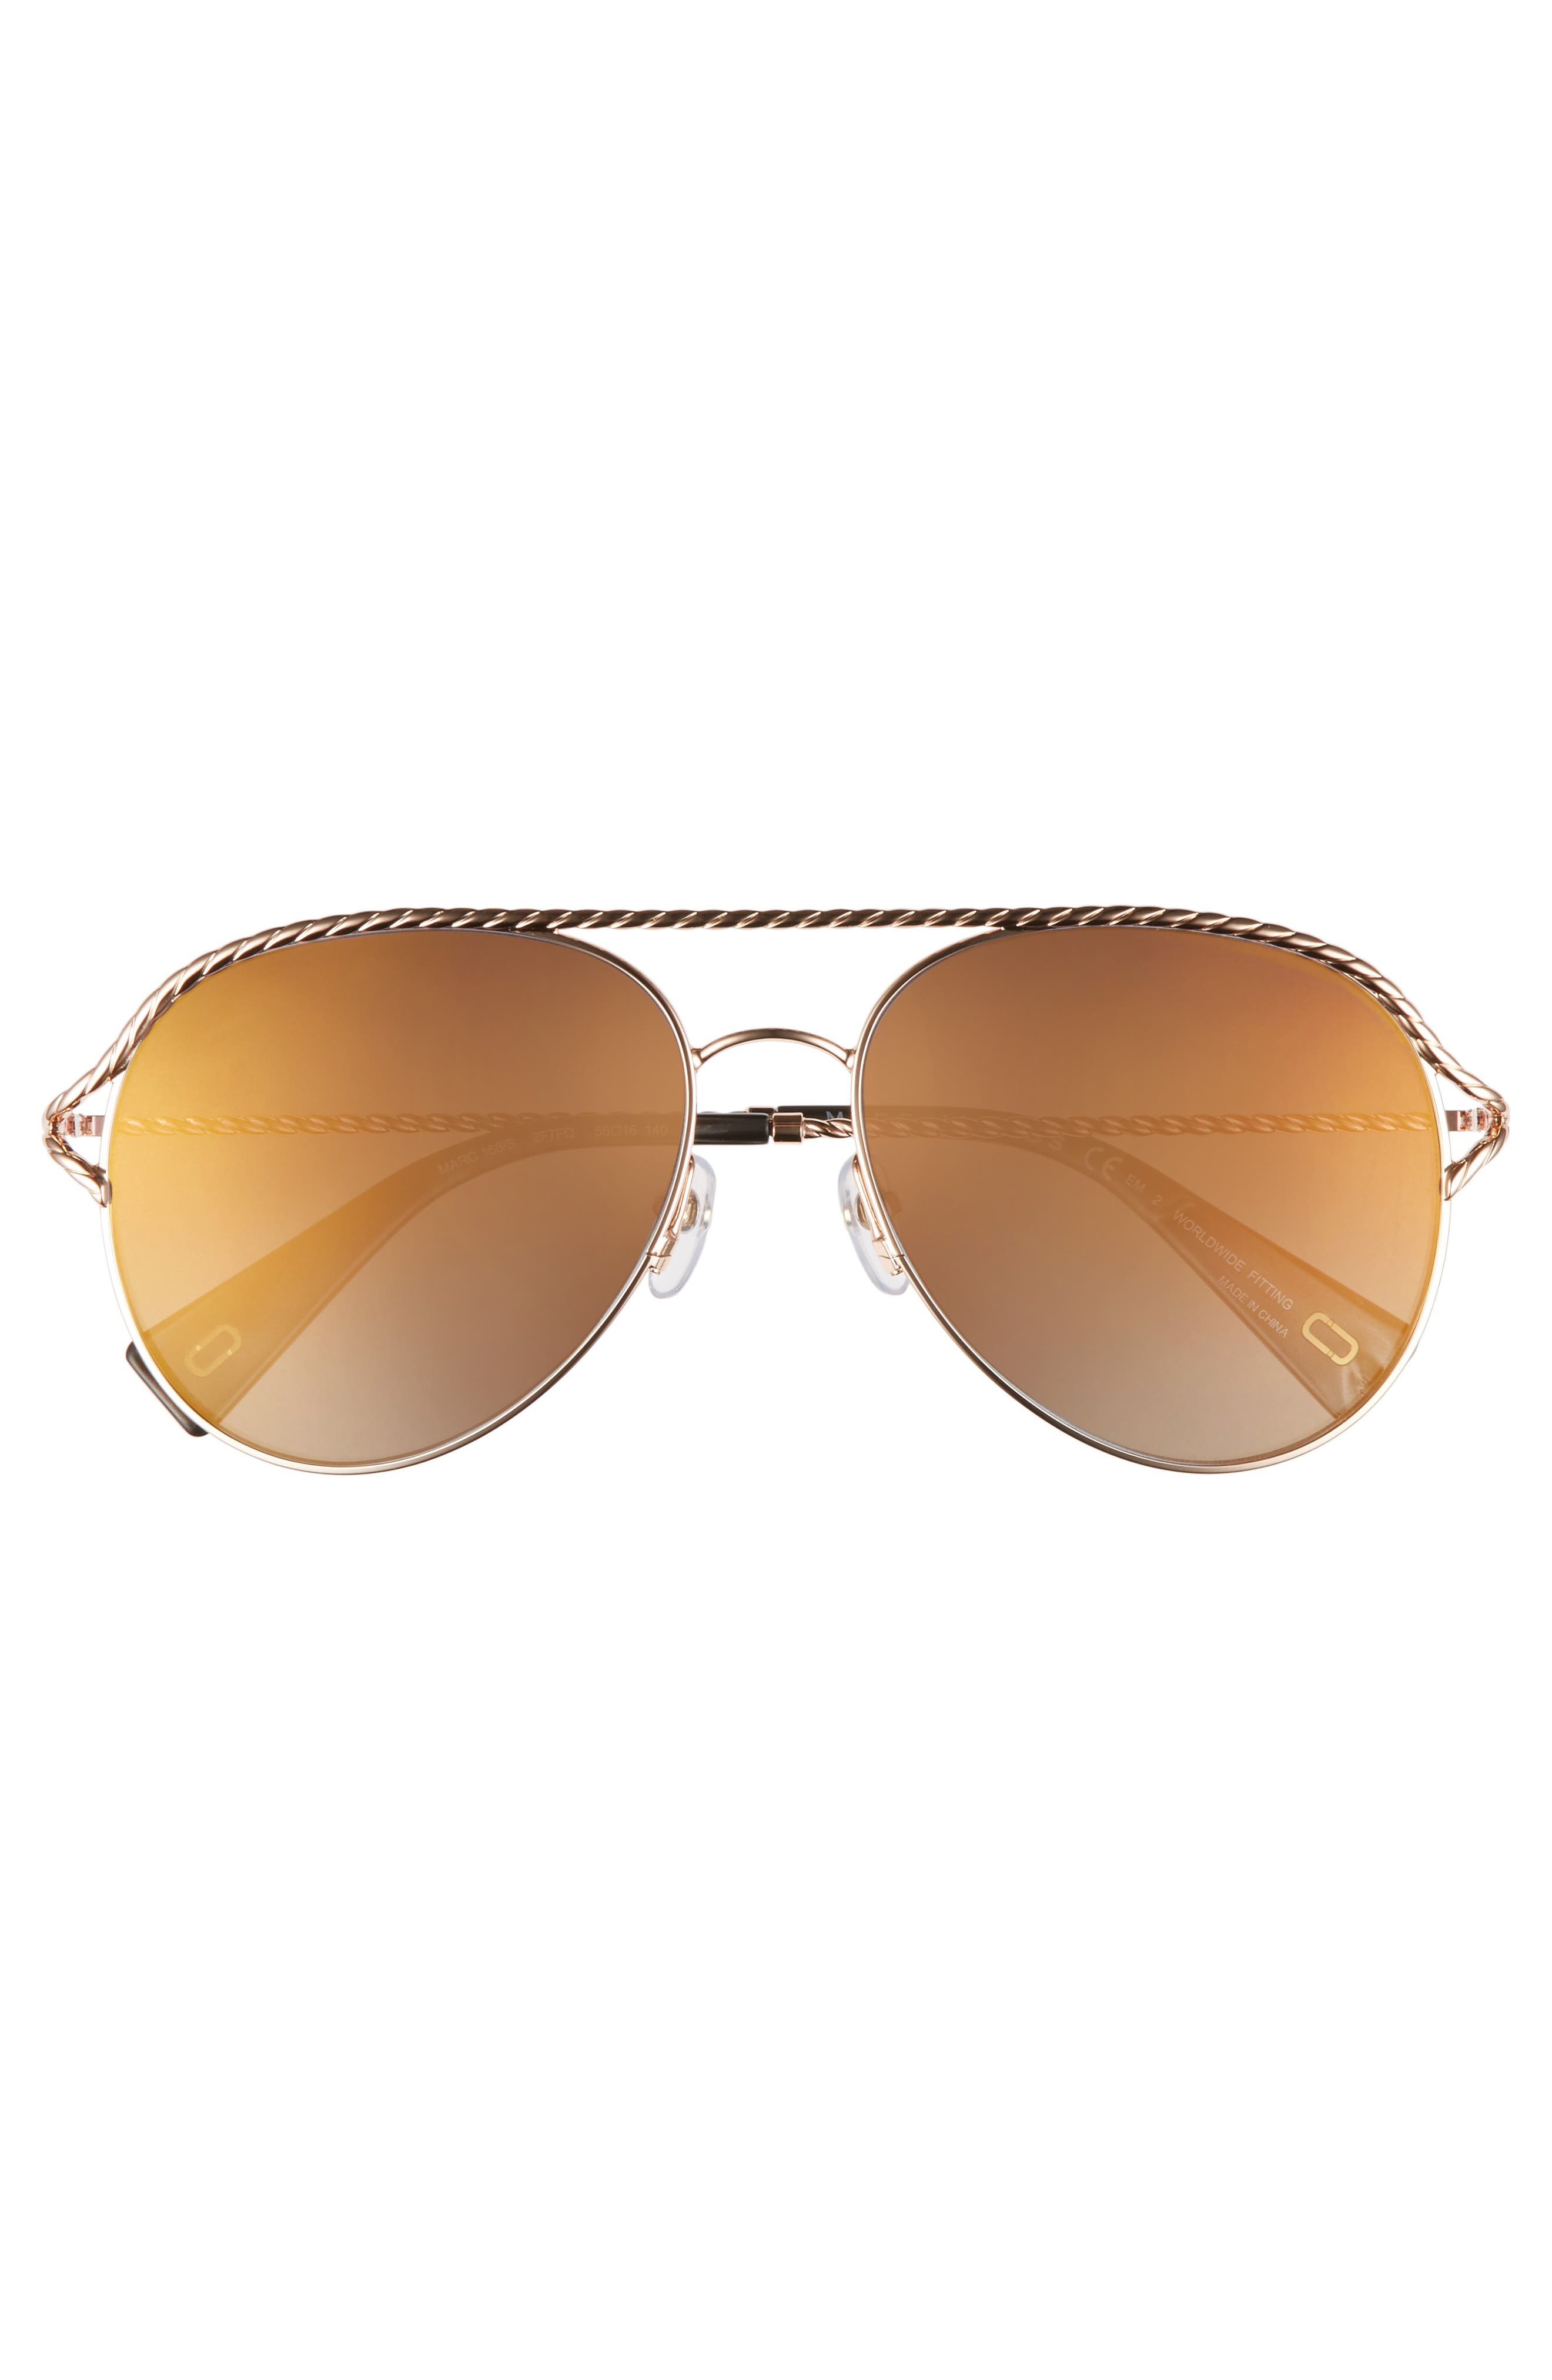 58mm Aviator Sunglasses,                             Alternate thumbnail 3, color,                             Antique Gold Green